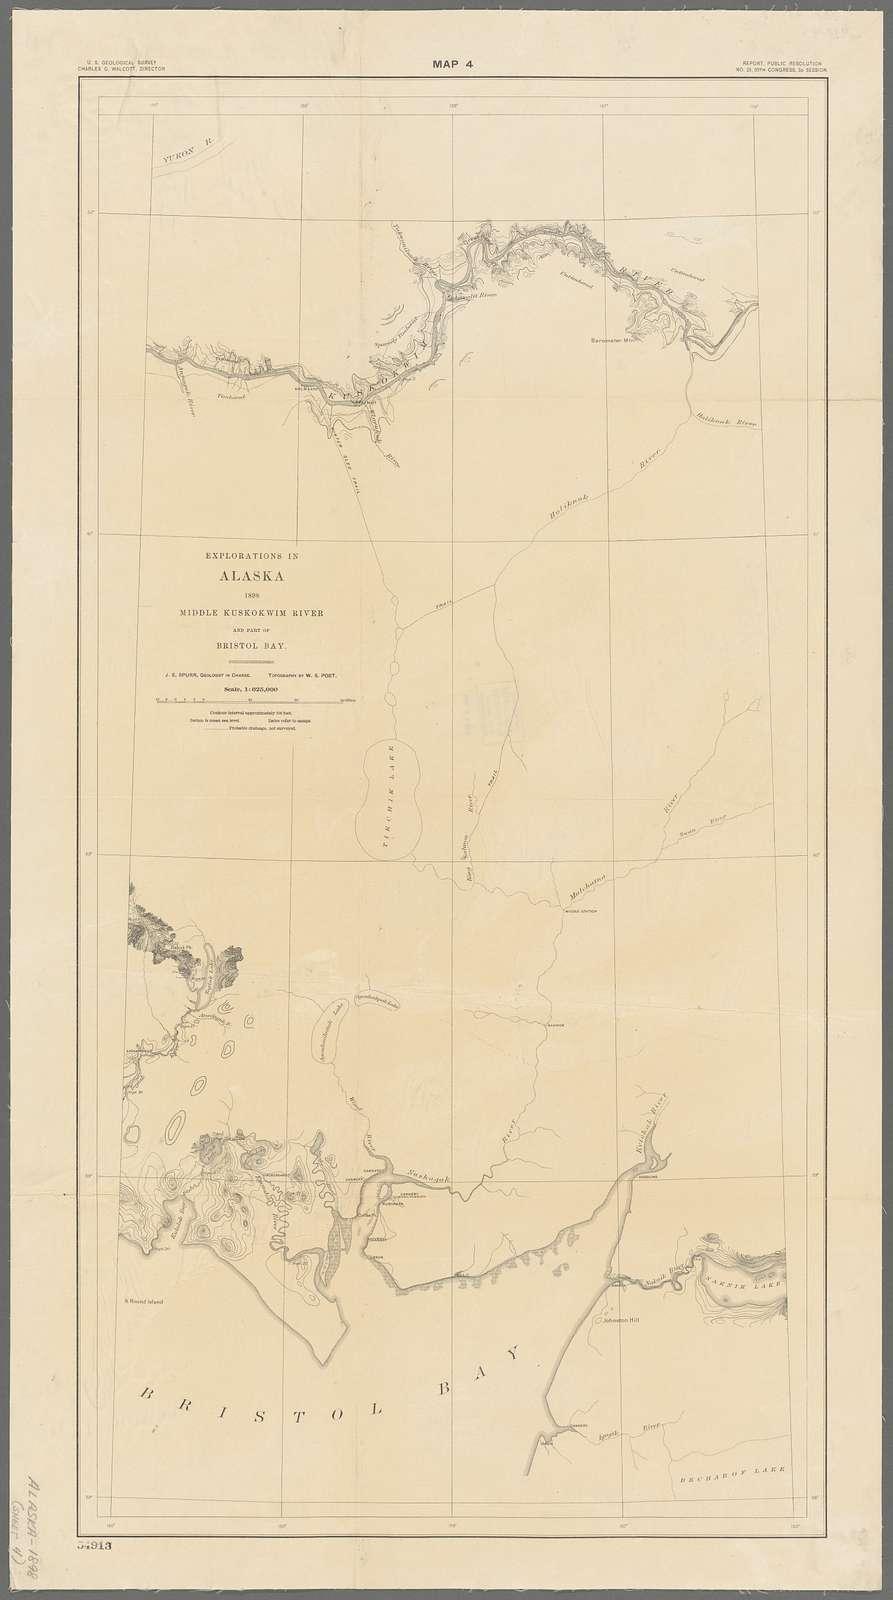 Explorations in Alaska, 1898 : Middle Kuskokwim River and part of Bristol Bay